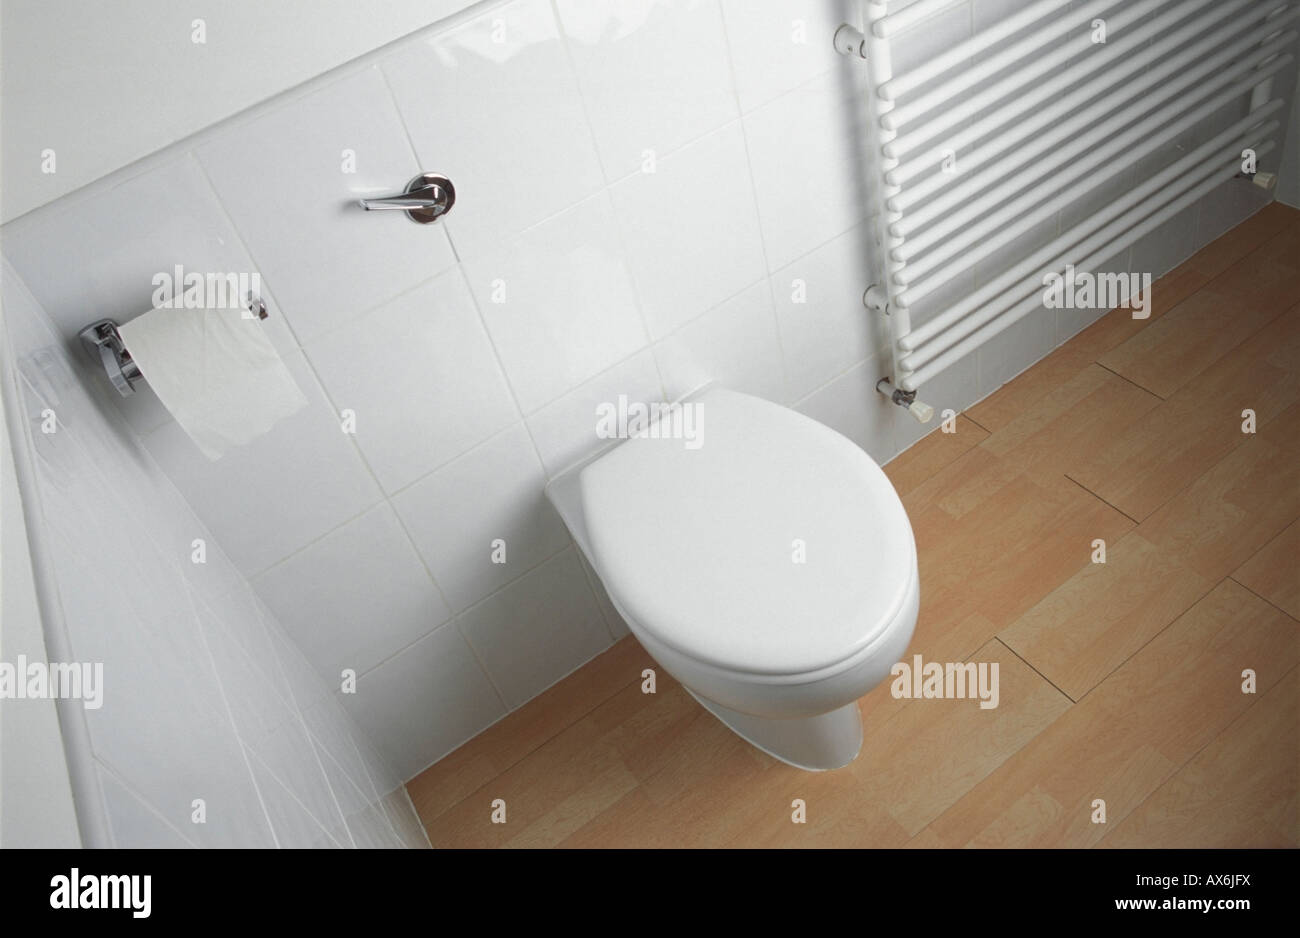 Radiator Voor Toilet : White toilet and towel radiator stock photo  alamy